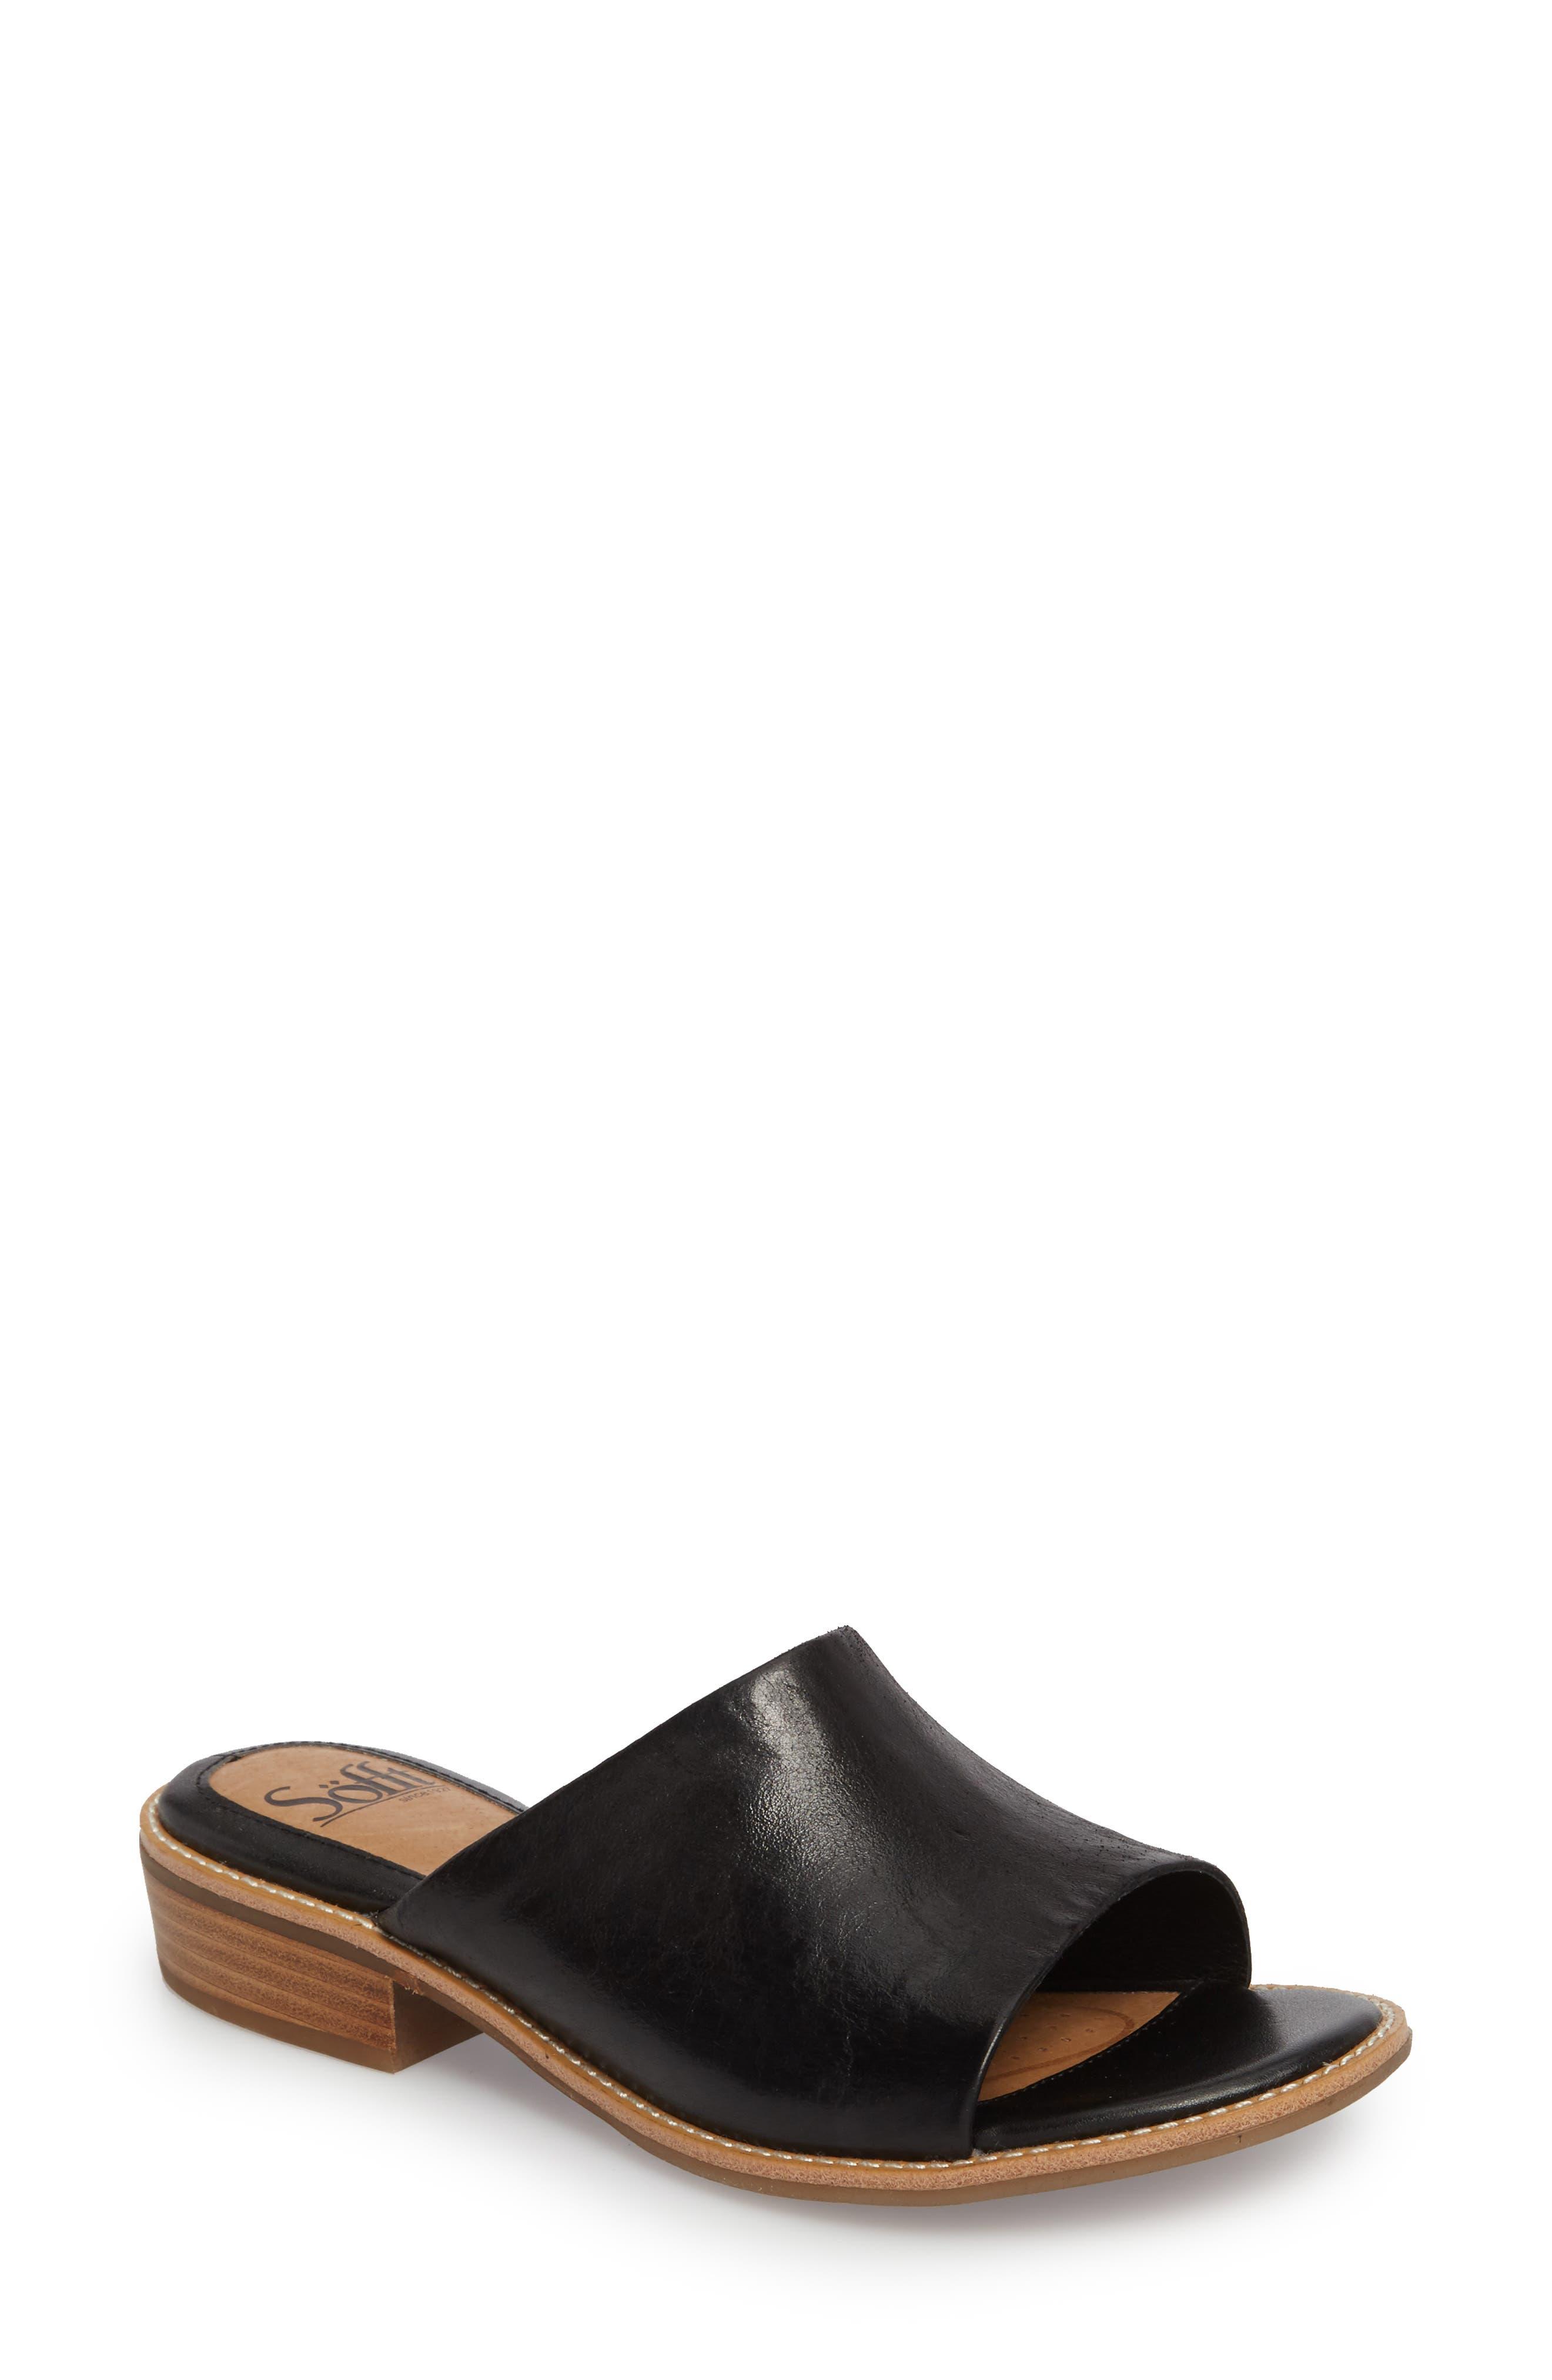 Nola Slide Sandal,                         Main,                         color,